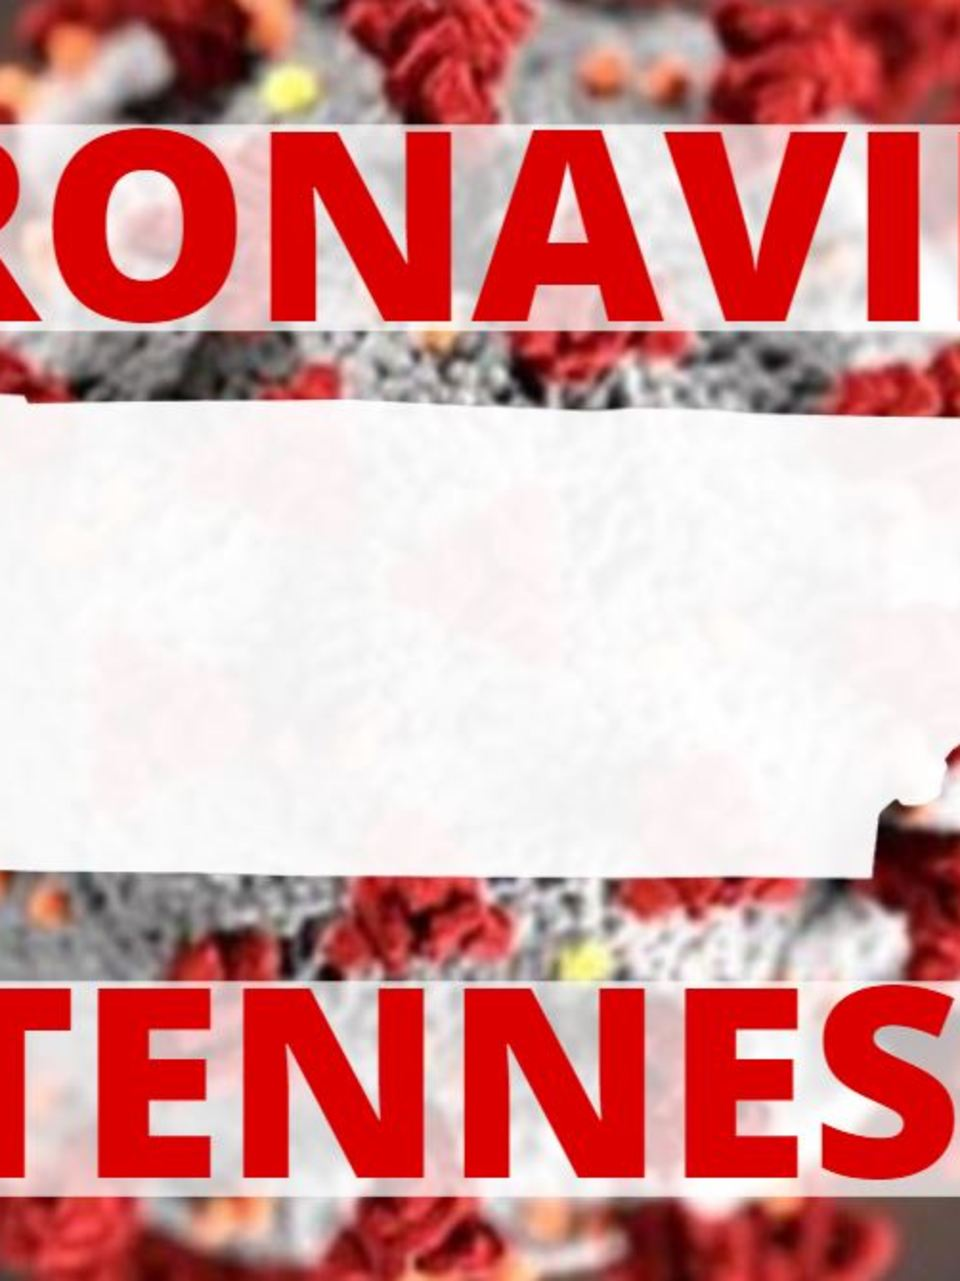 32 cases of novel coronavirus confirmed in Tennessee | WTVC